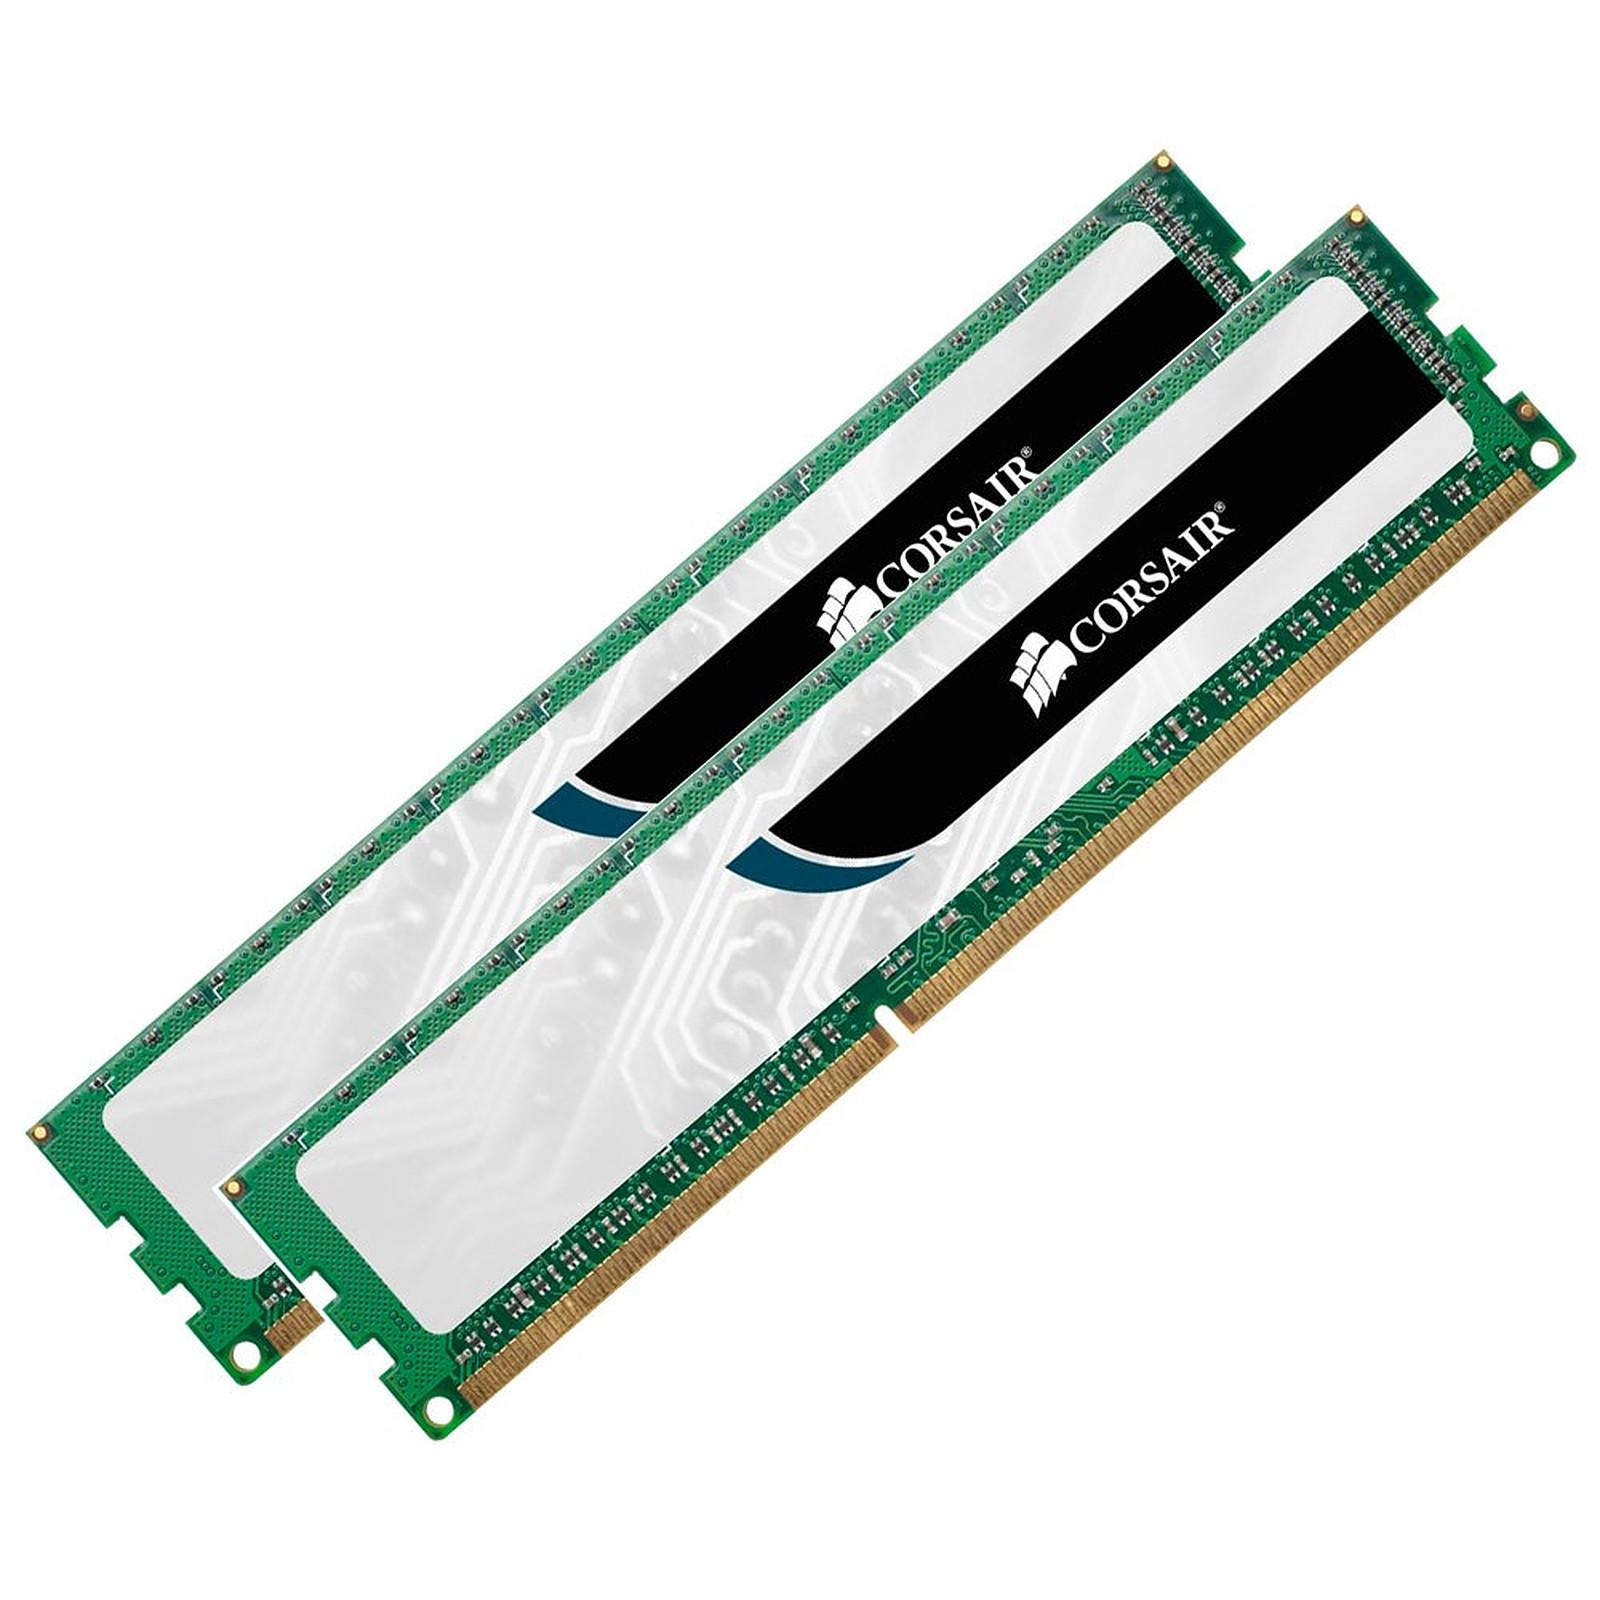 Corsair Value Select 4 Go (2x 2 Go) DDR3 1333MHz CL9